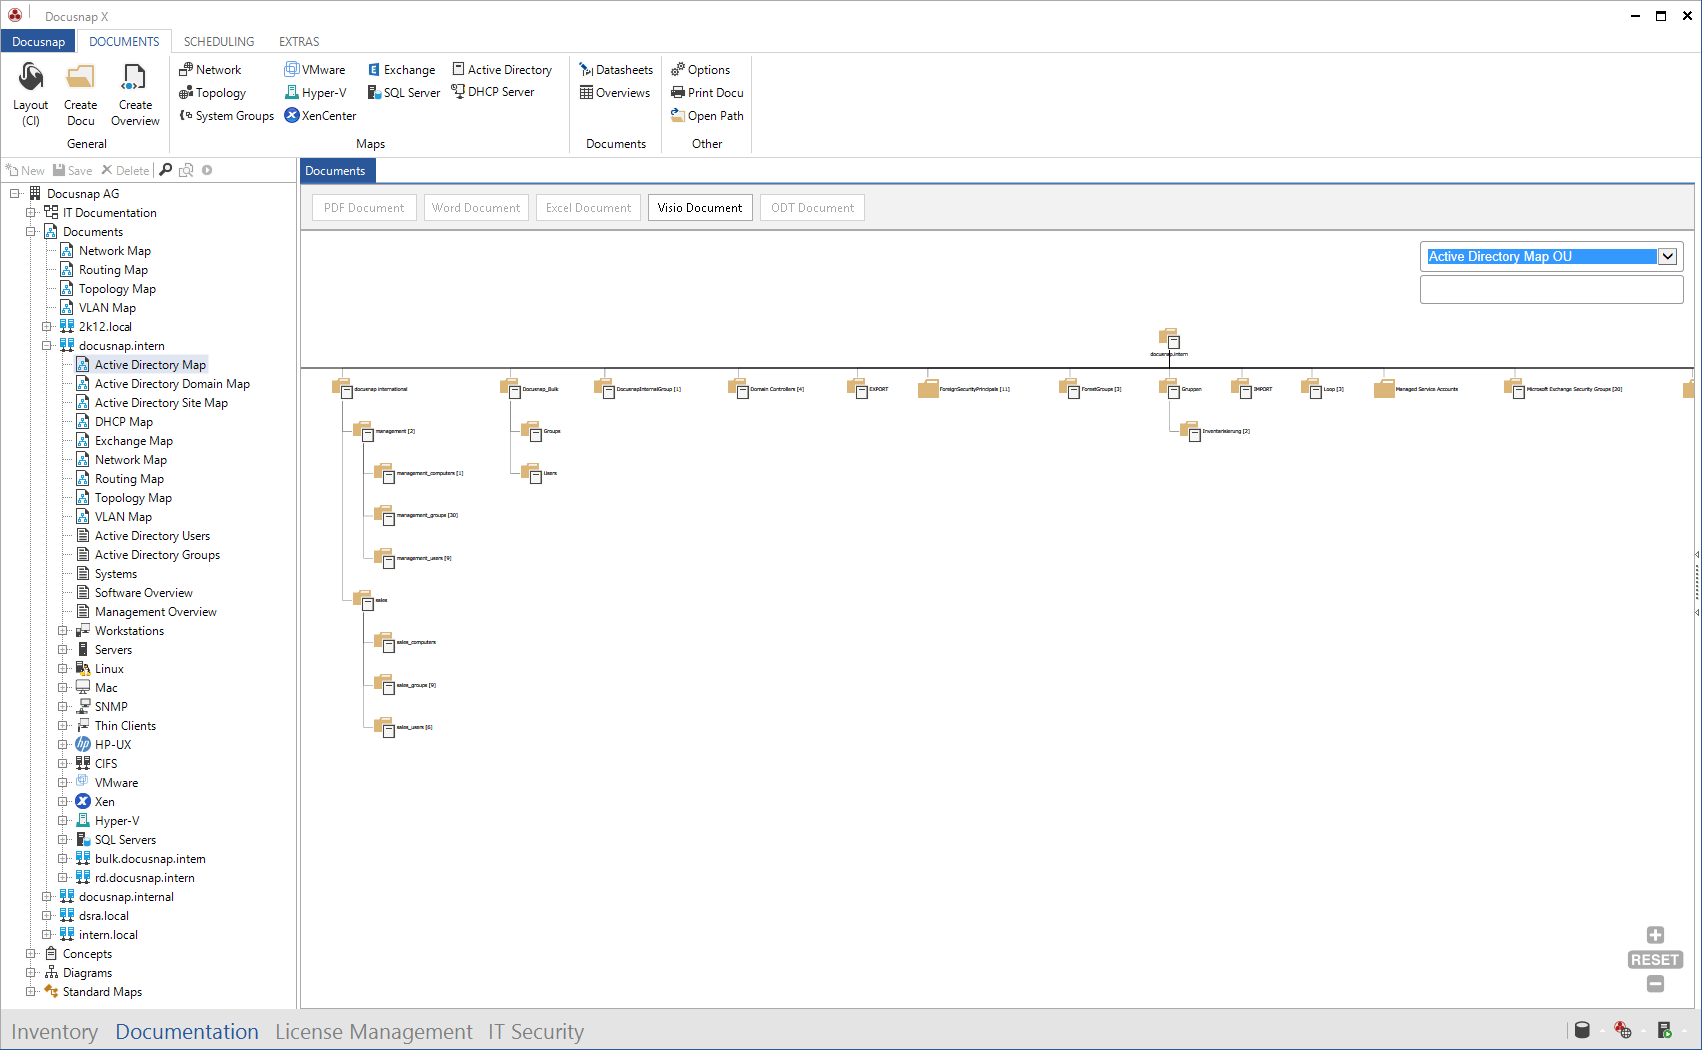 Screenshot: Active Directory Map OU